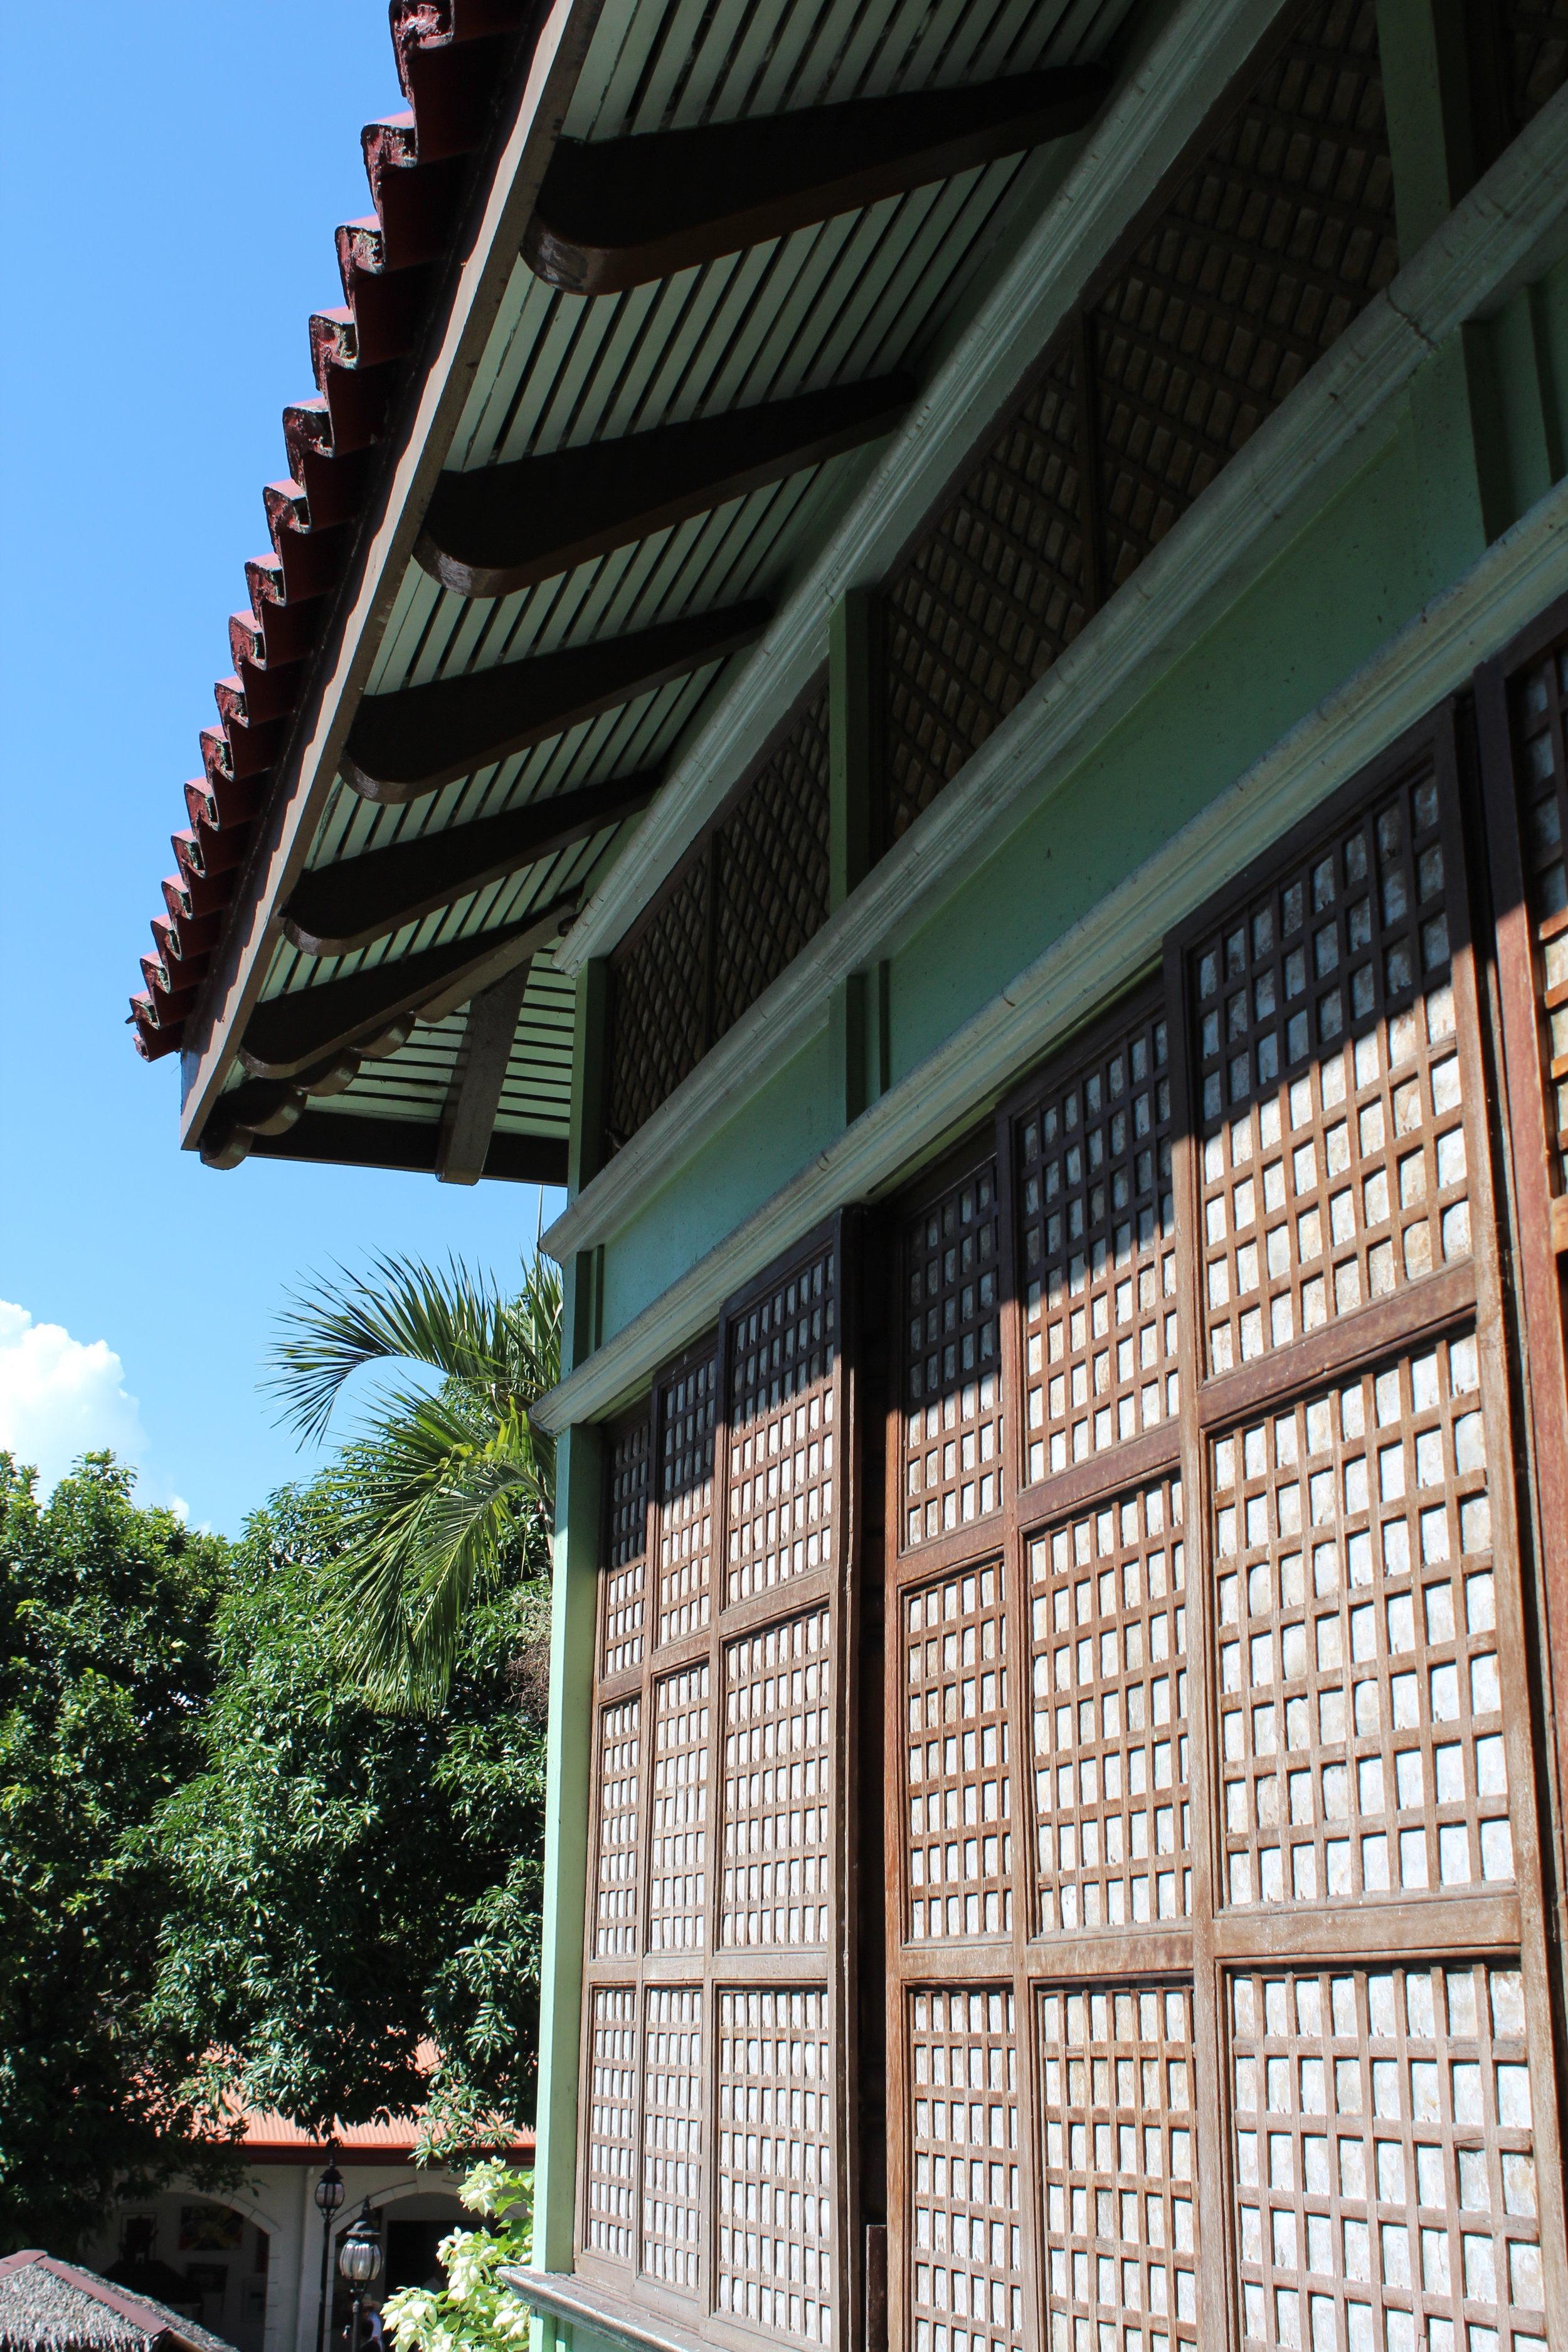 Rizal Shrine, Calamba, Laguna